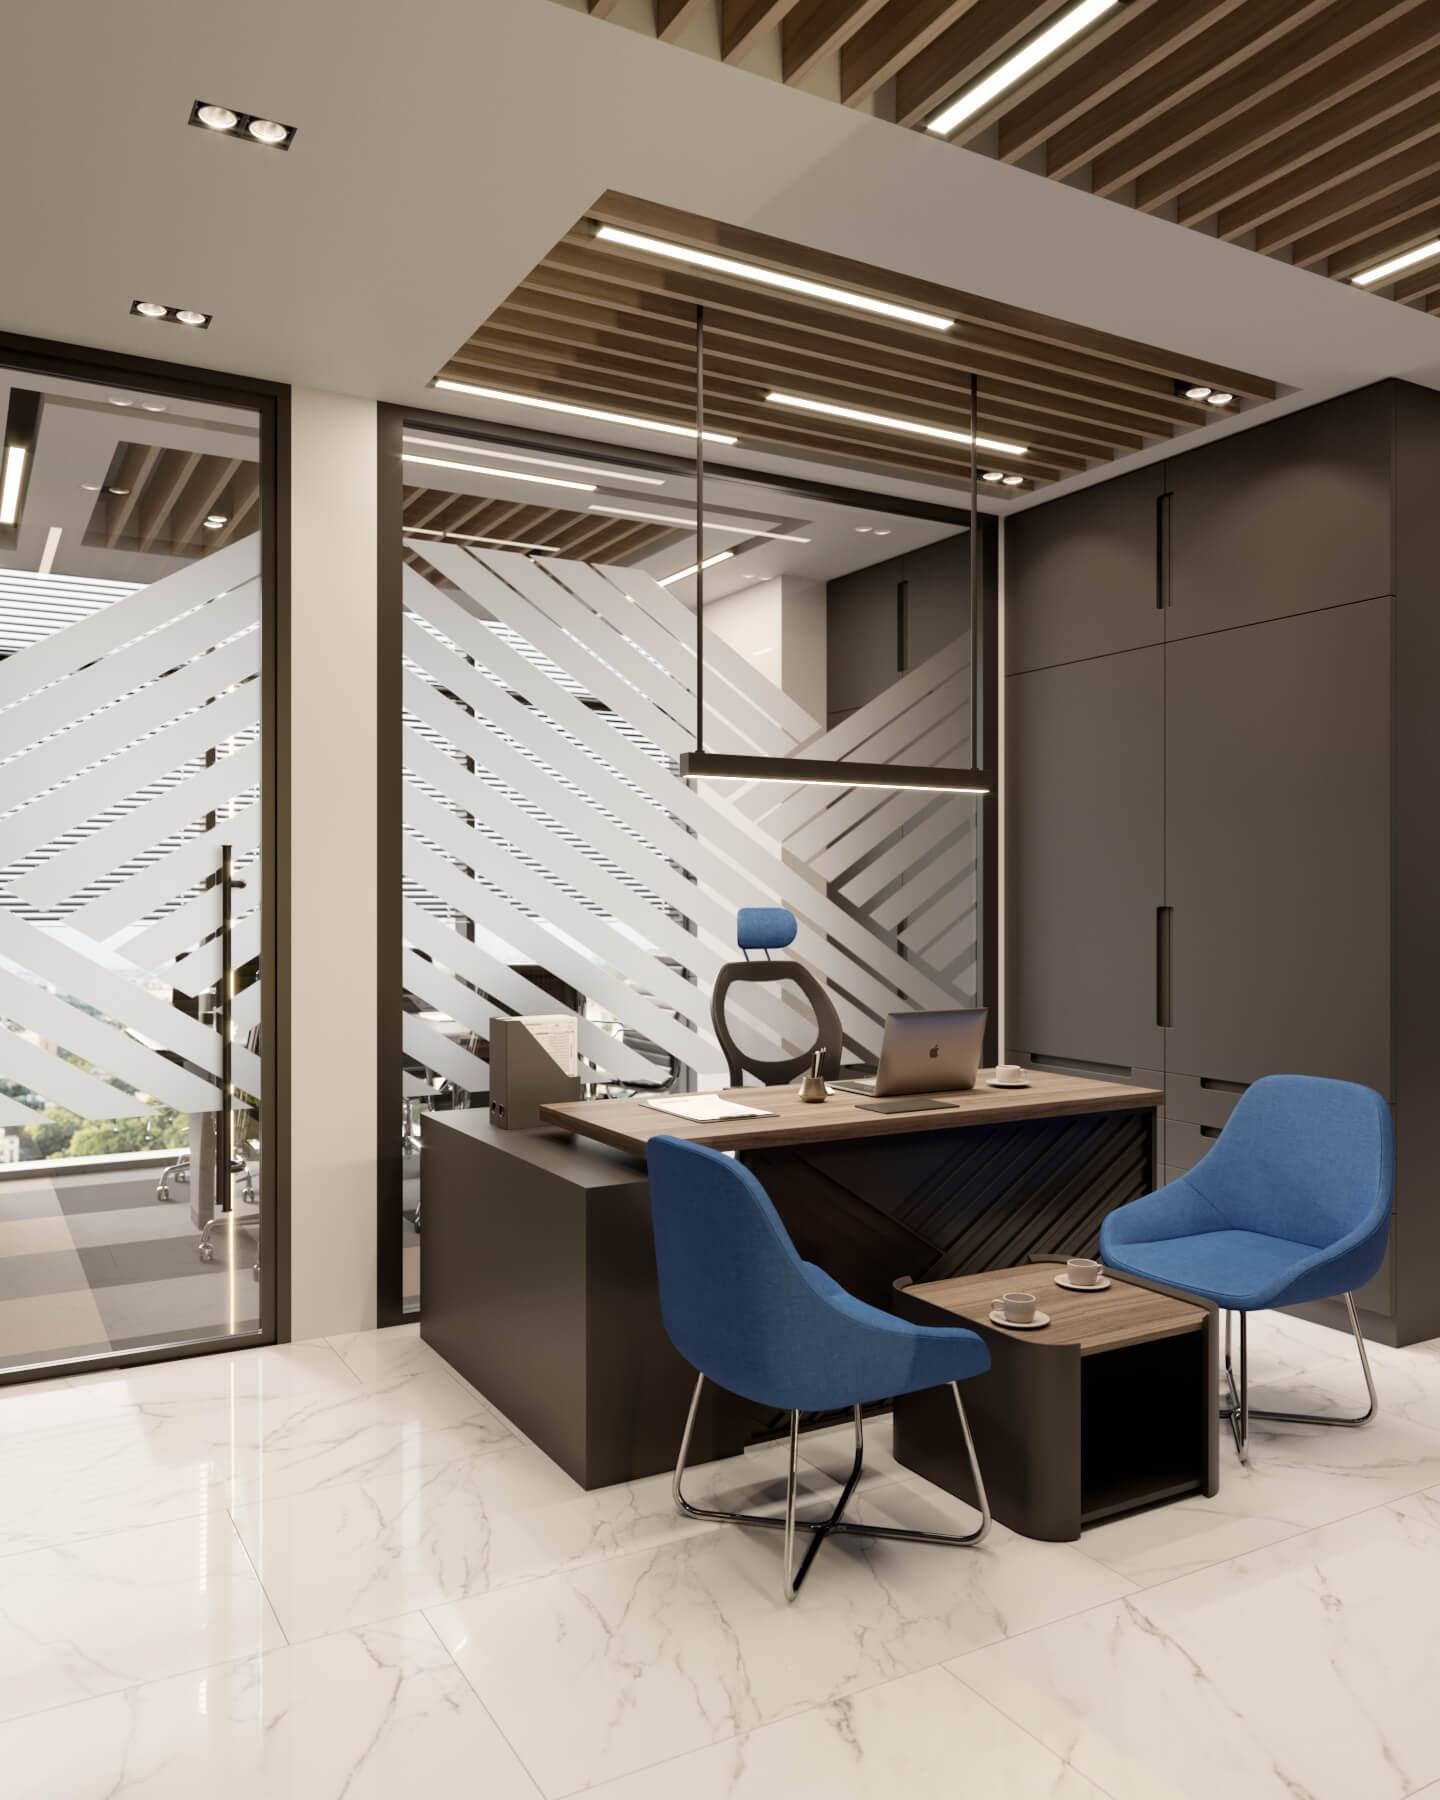 ofis içmimari 4107 Anadolu Hayat Emeklilik Ofisler